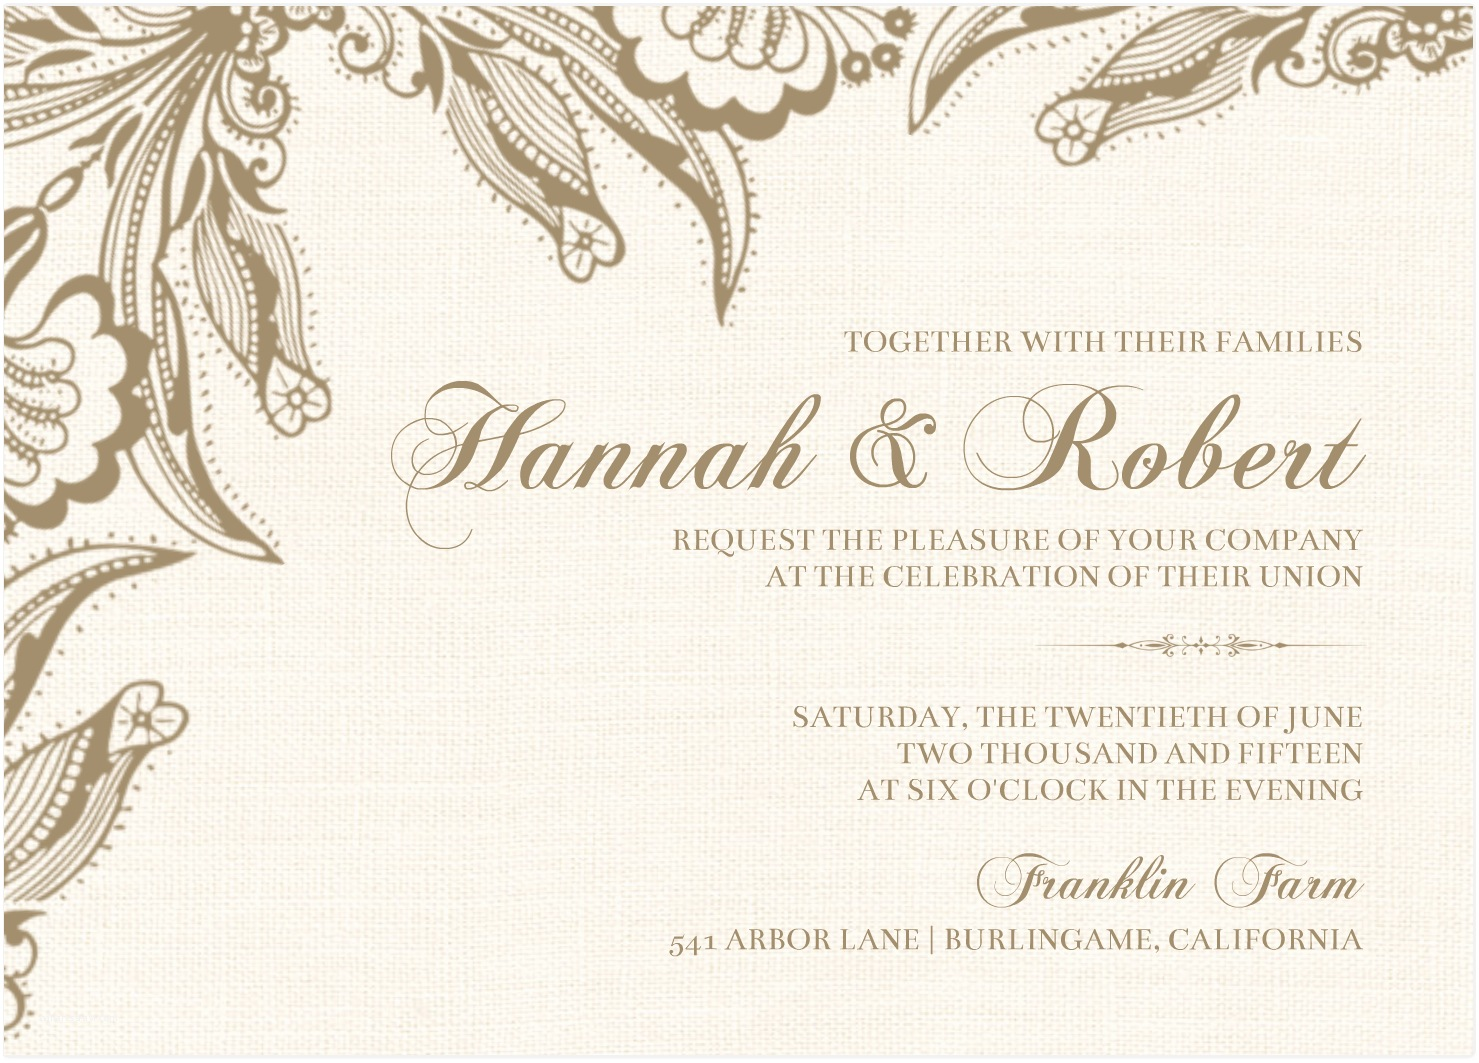 Wedding Invitation Design Images Inspirational Wedding Invitation Card Design Samples